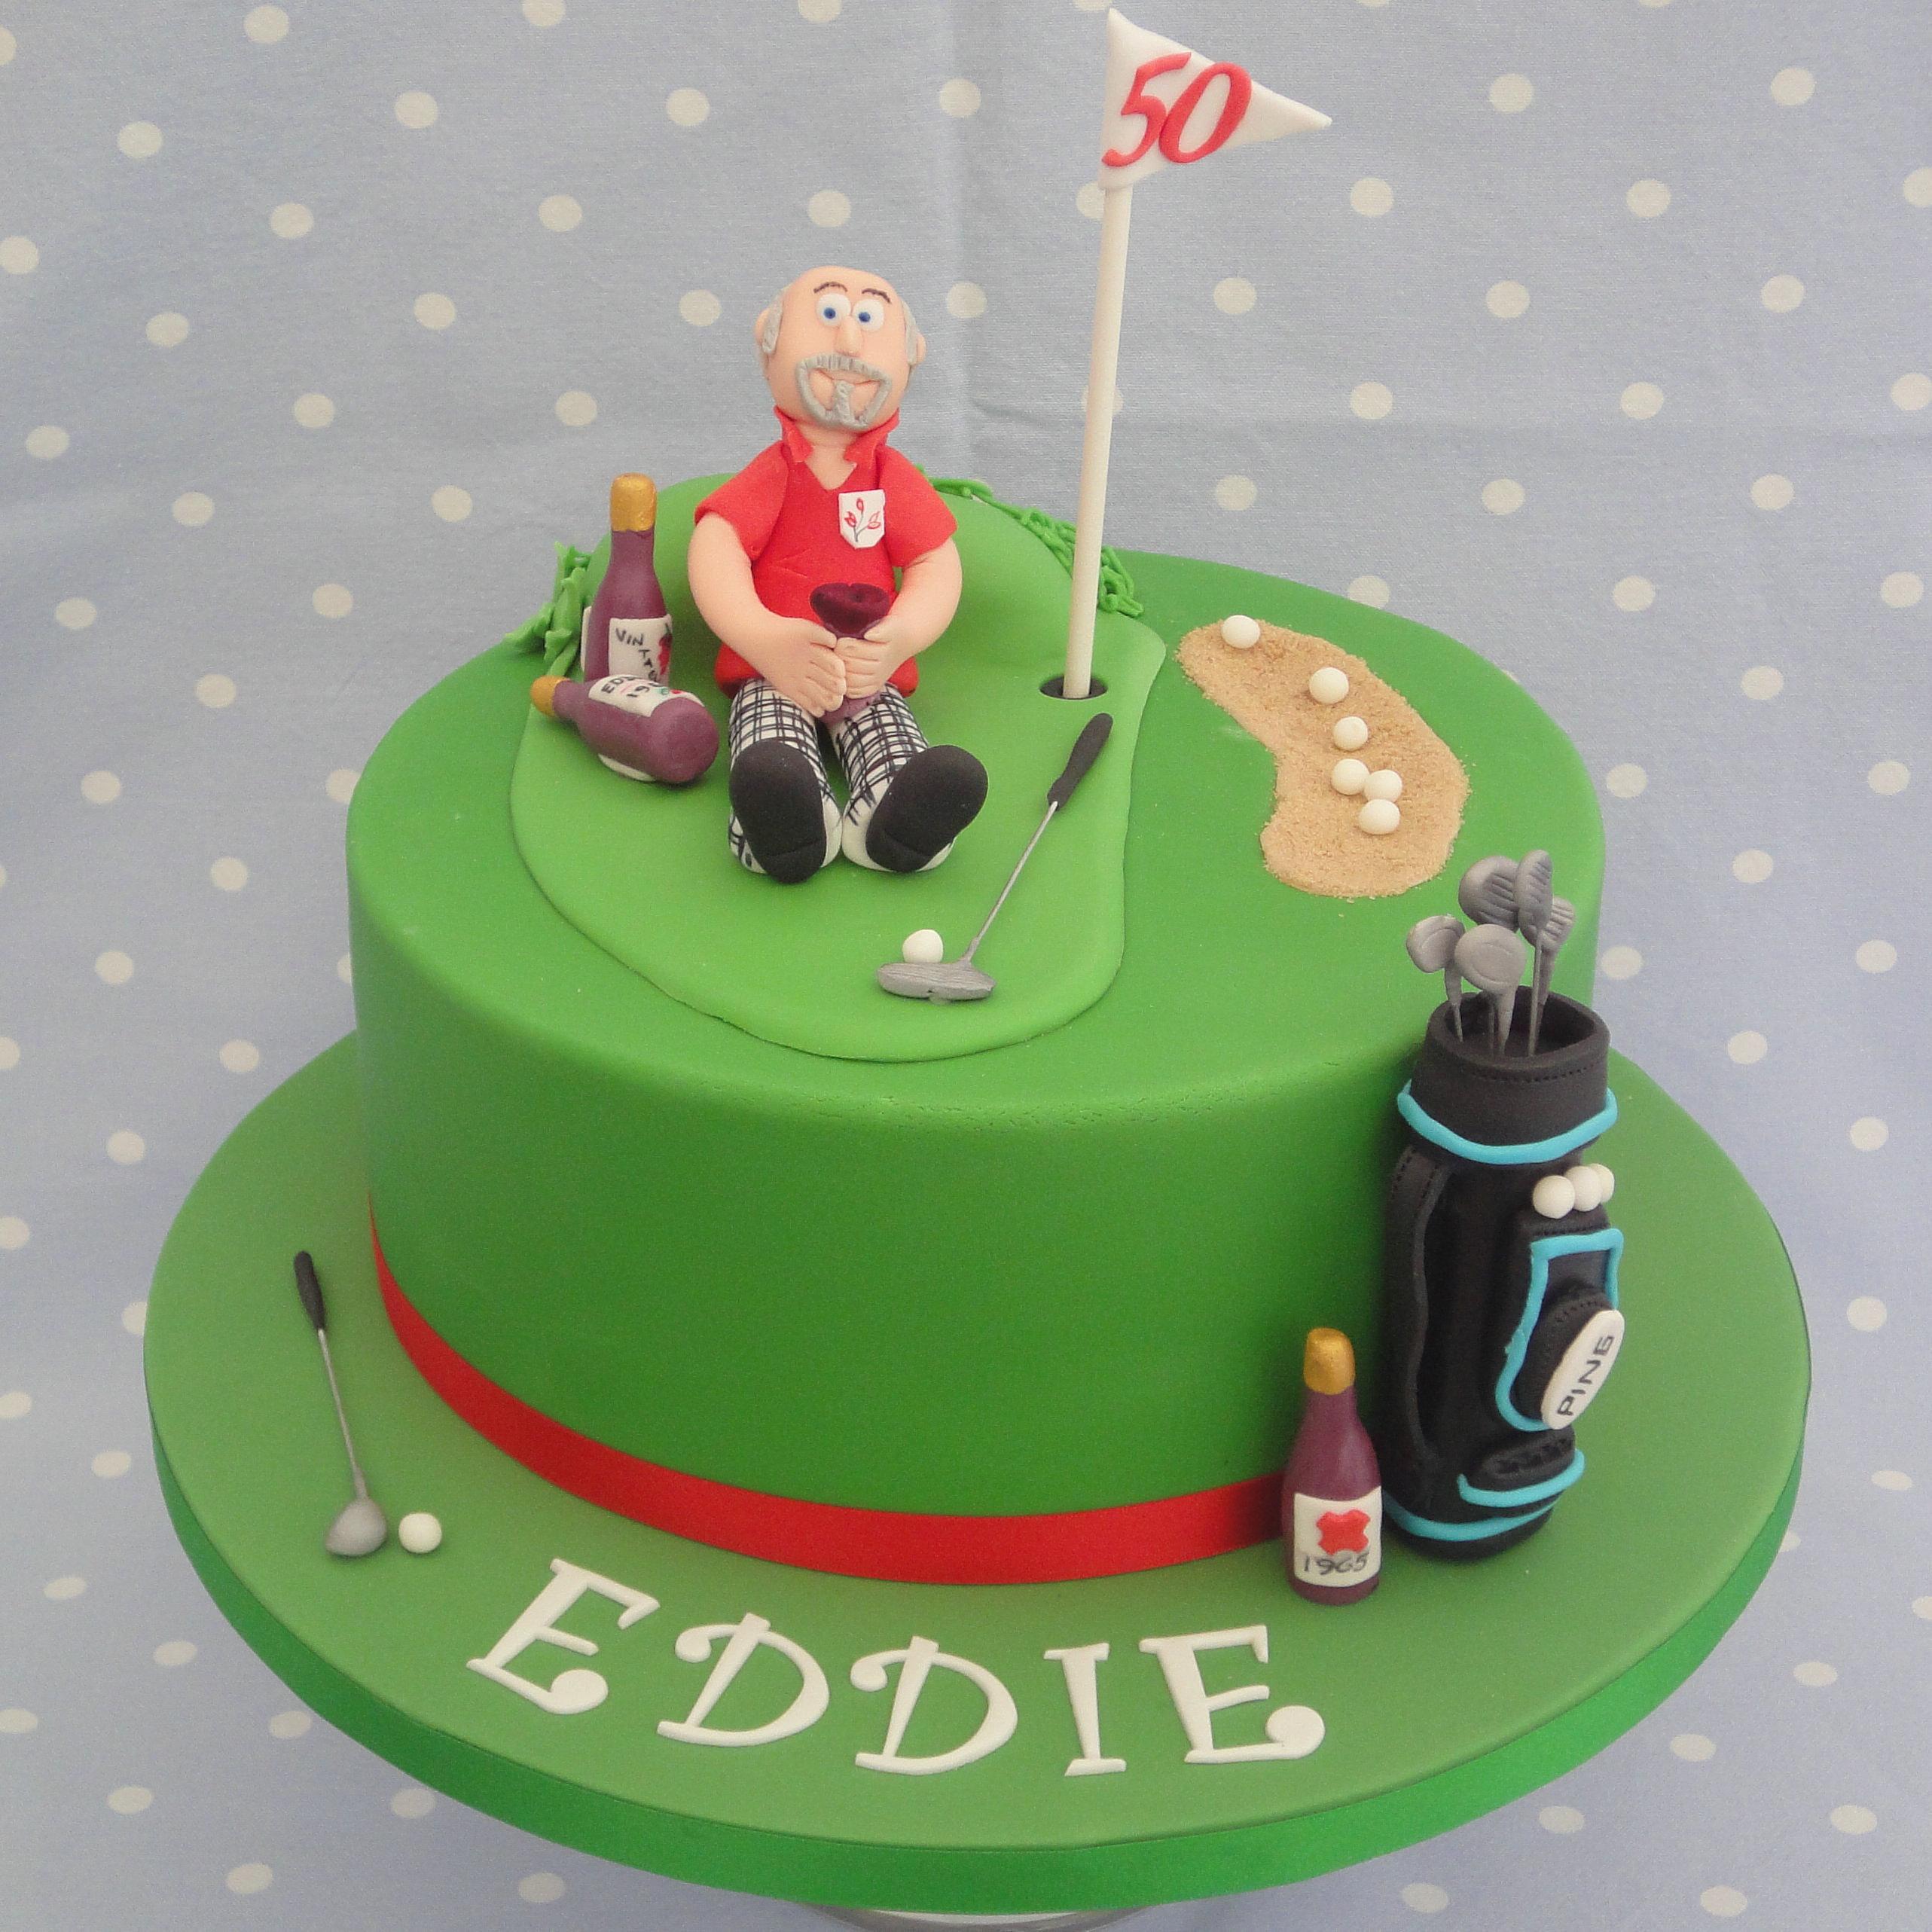 Fondant Golf Cake Design : Stunning Cakes GOLF CAKE.jpg